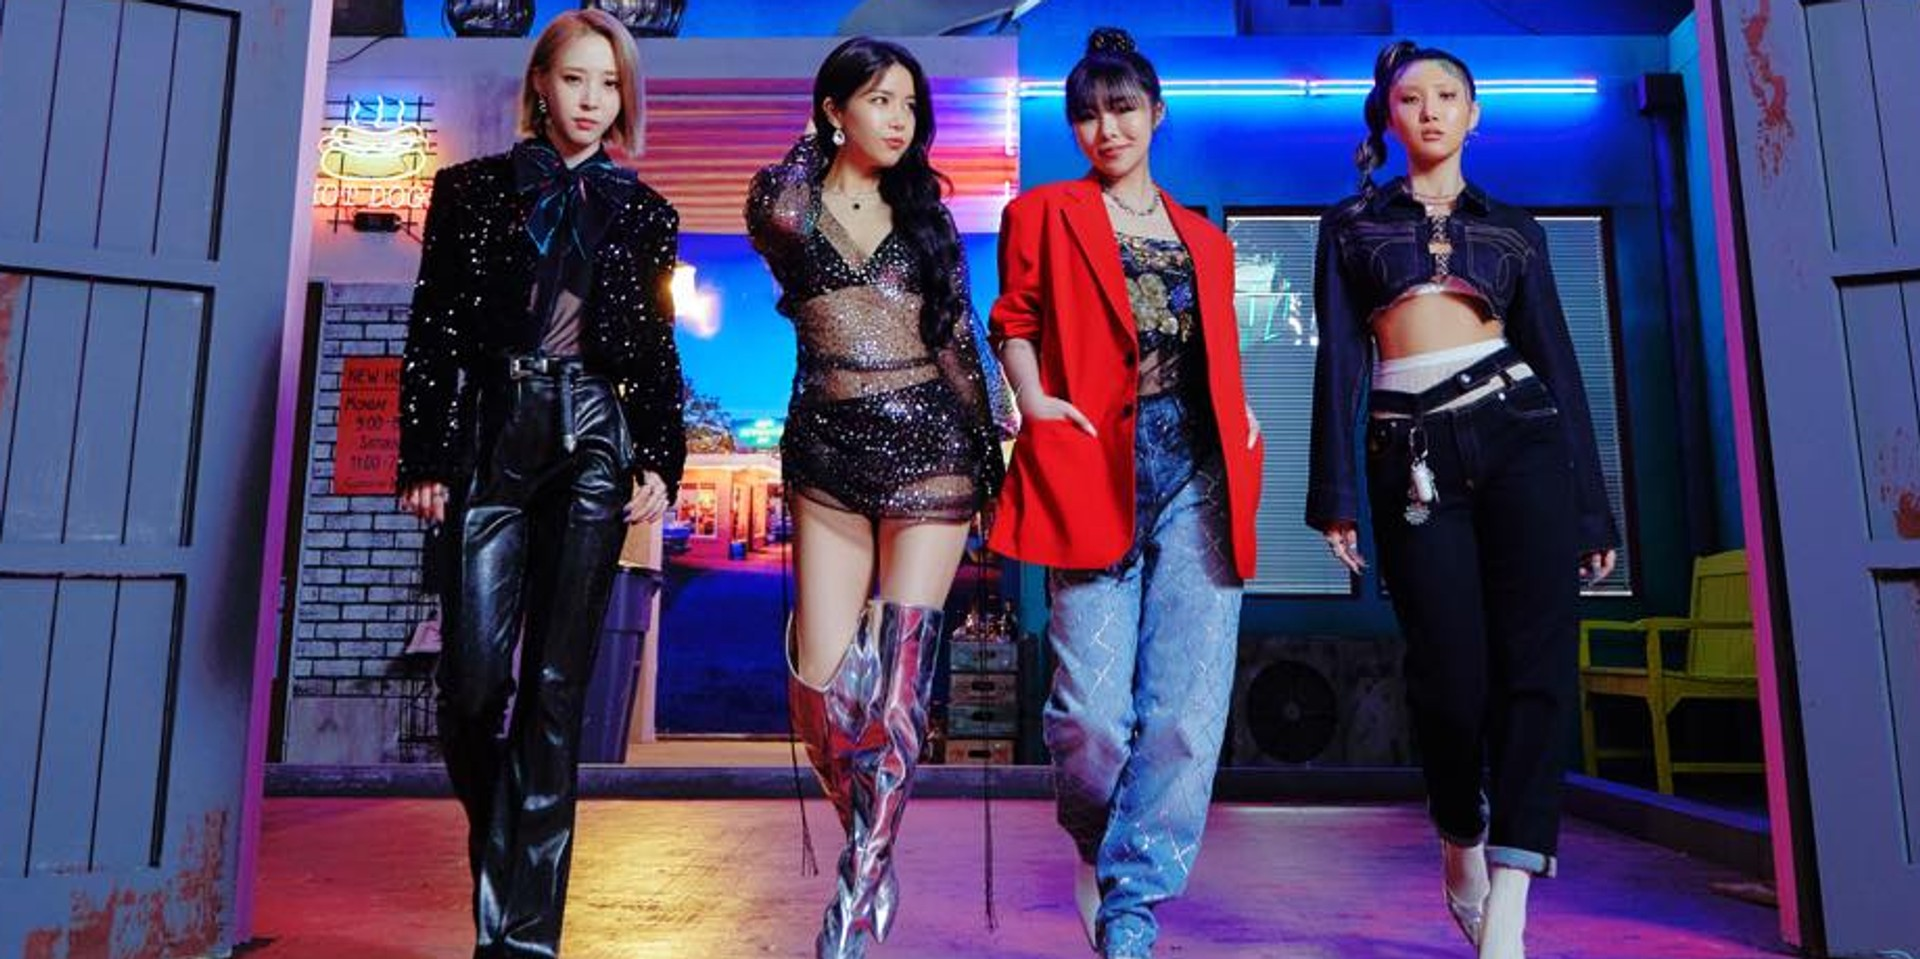 MAMAMOO's online concert to kick off LIVENow's K-pop series |